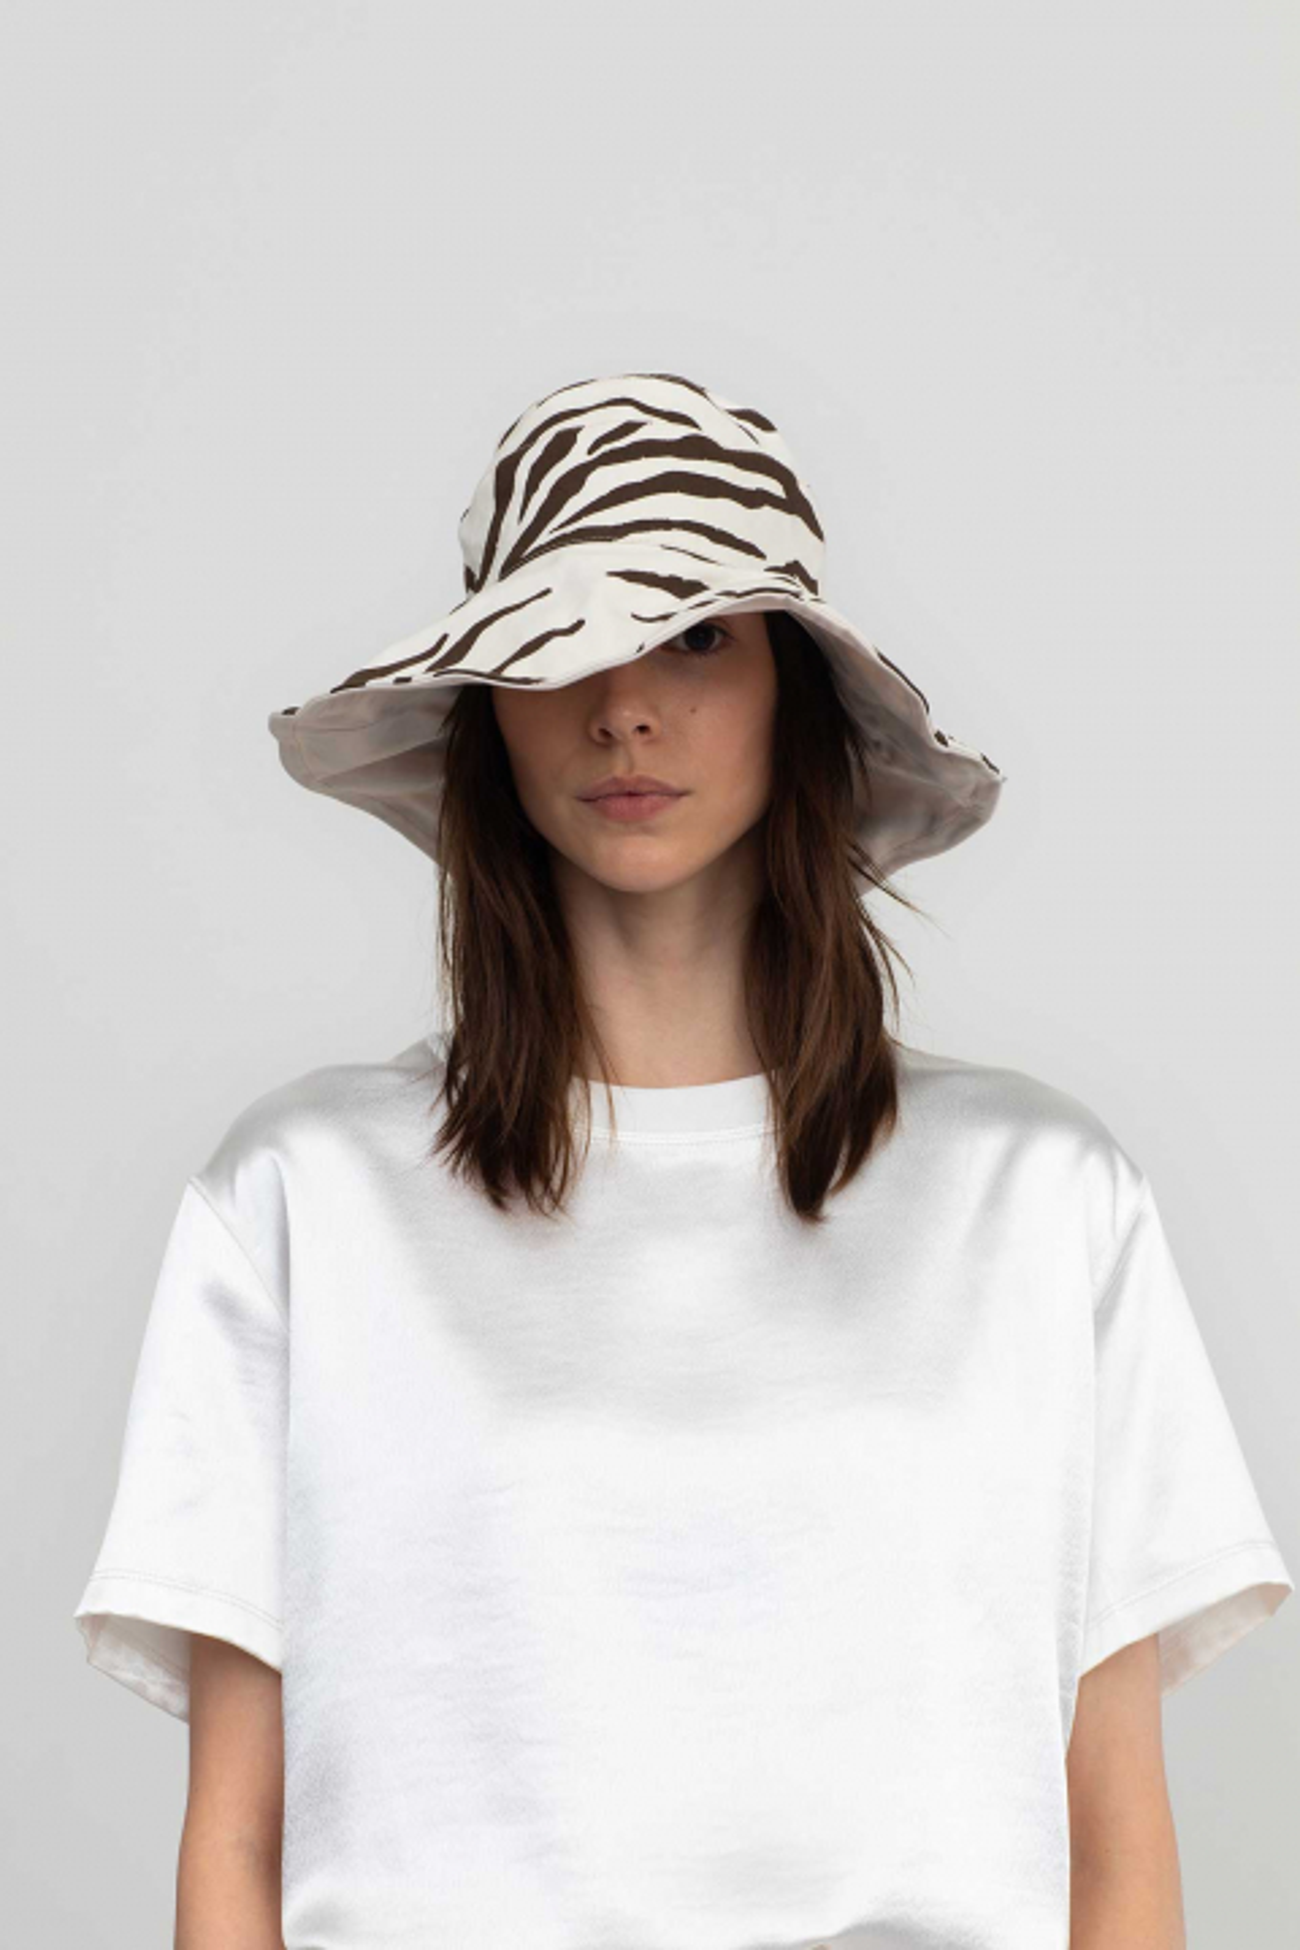 Reversible bucket hat 3014 in cottonnatural white/brown